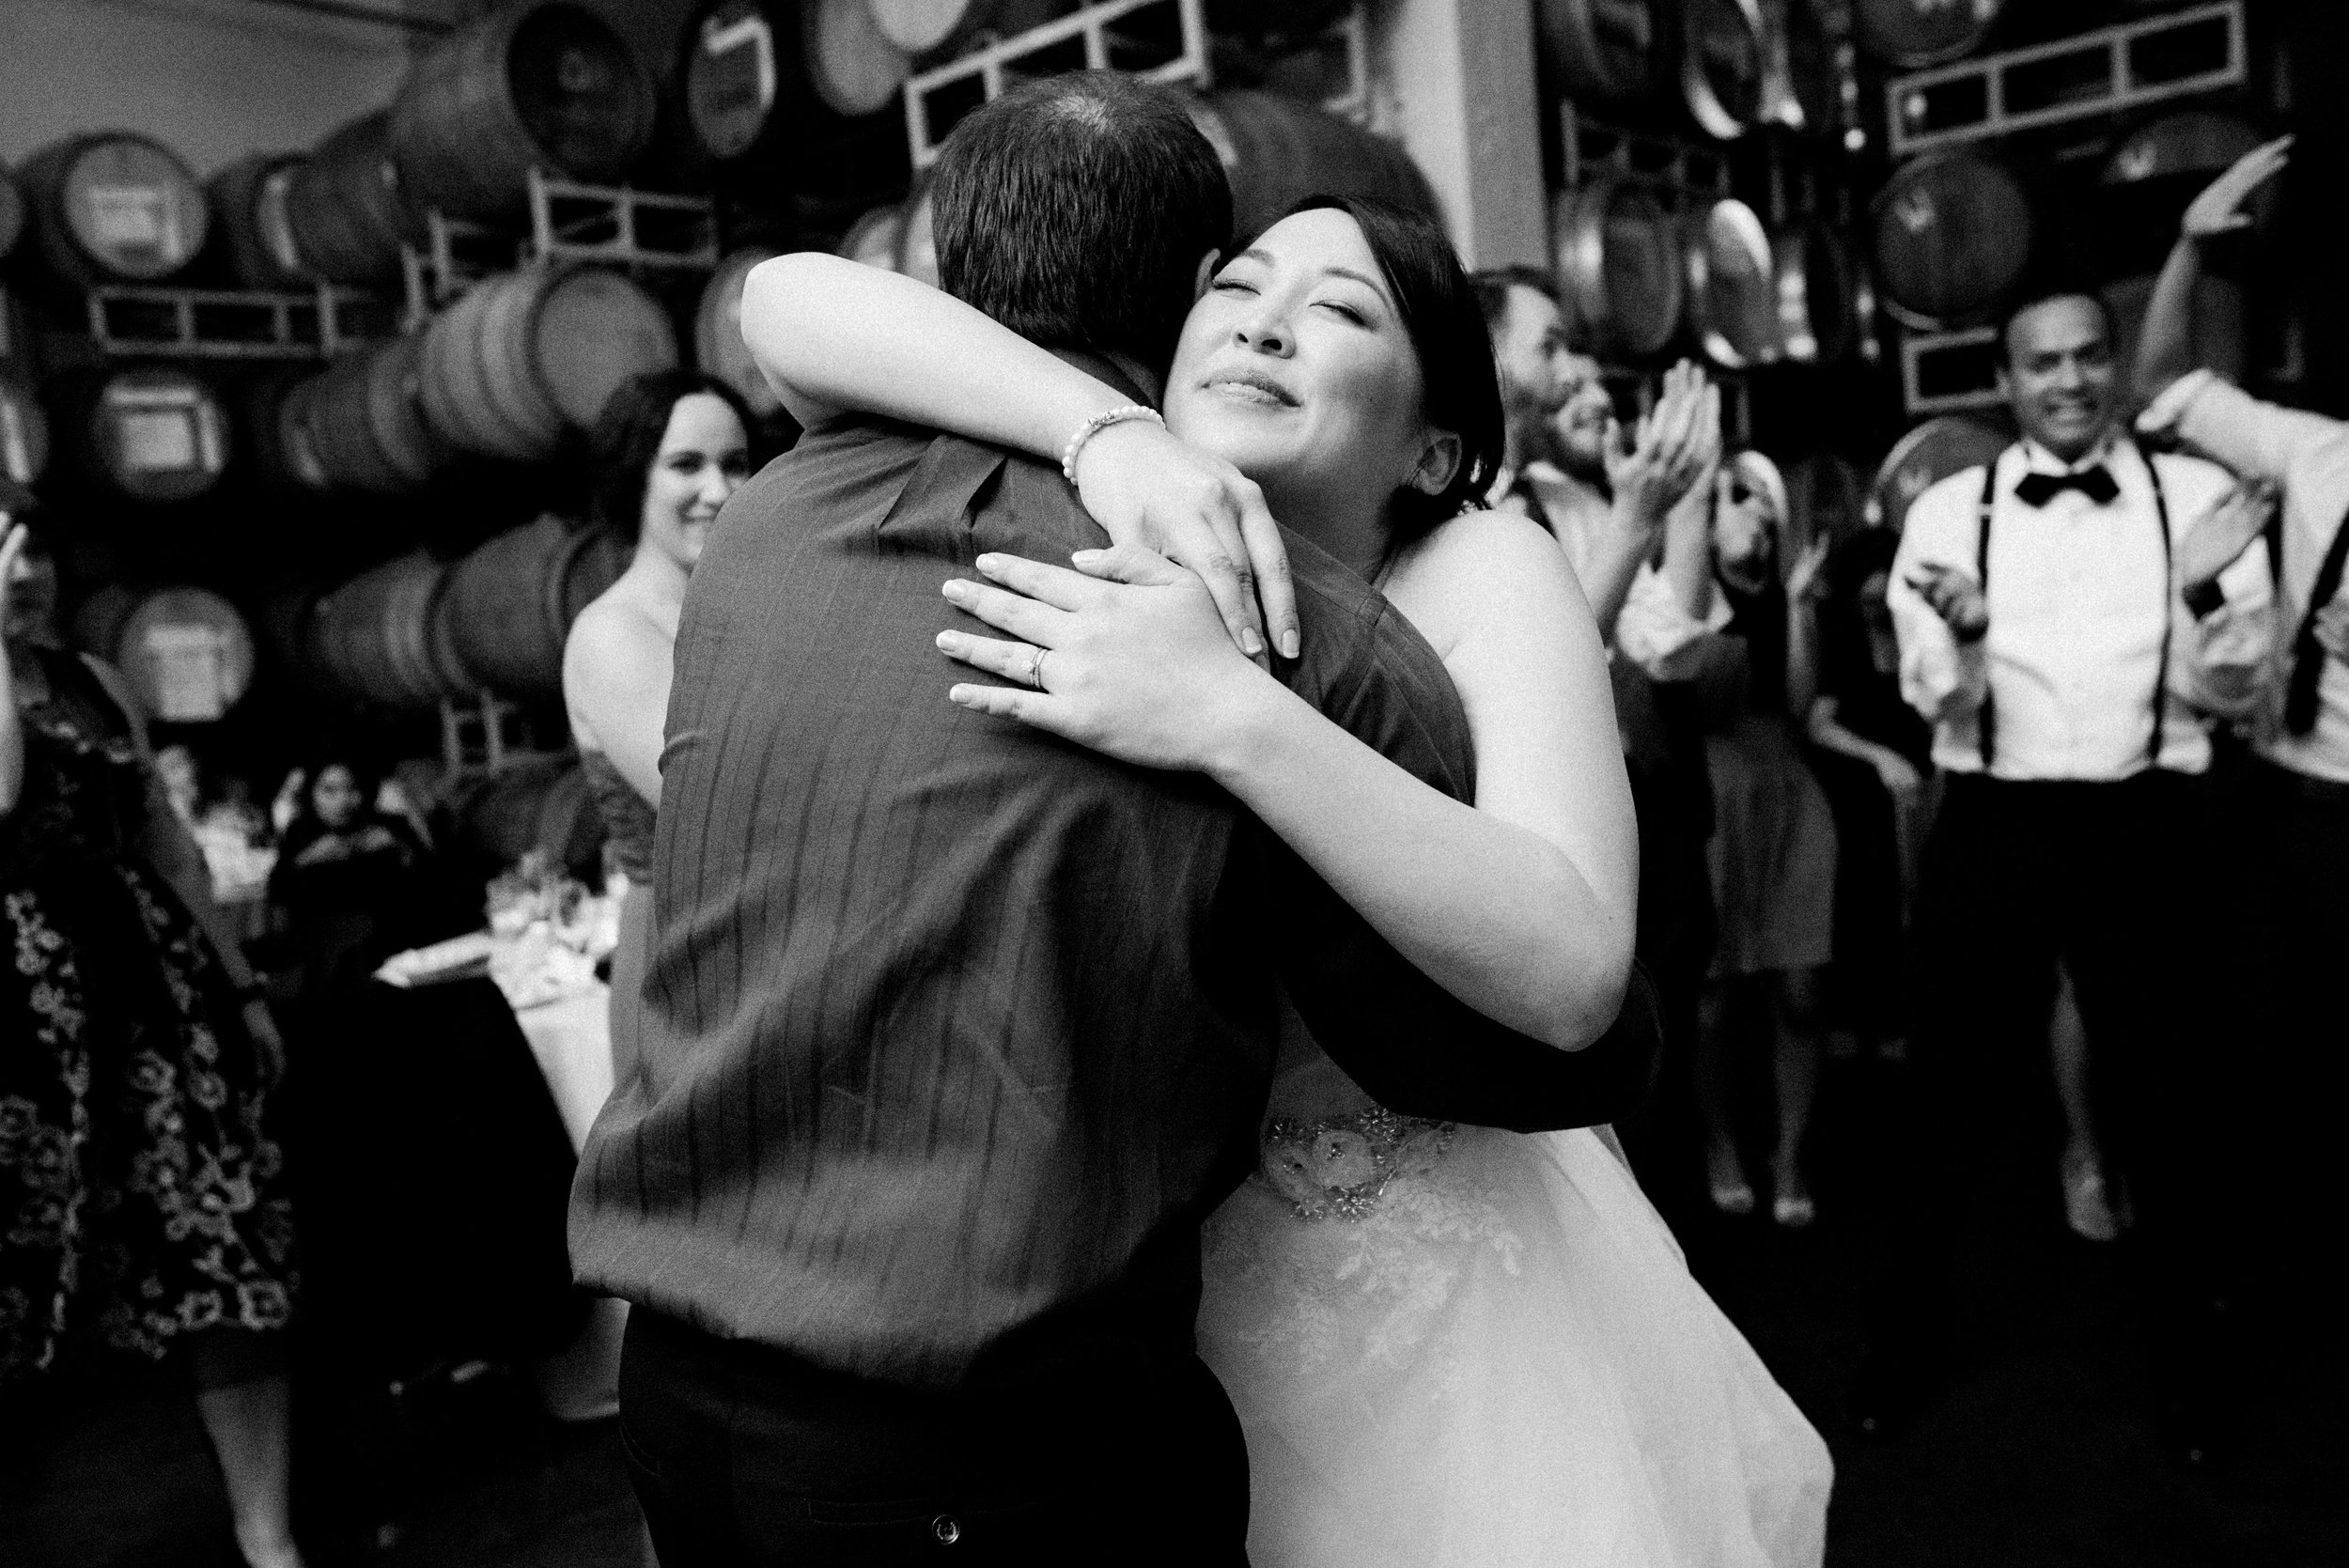 Swedenborgian Church Dogpatch Winery Wedding100.jpg